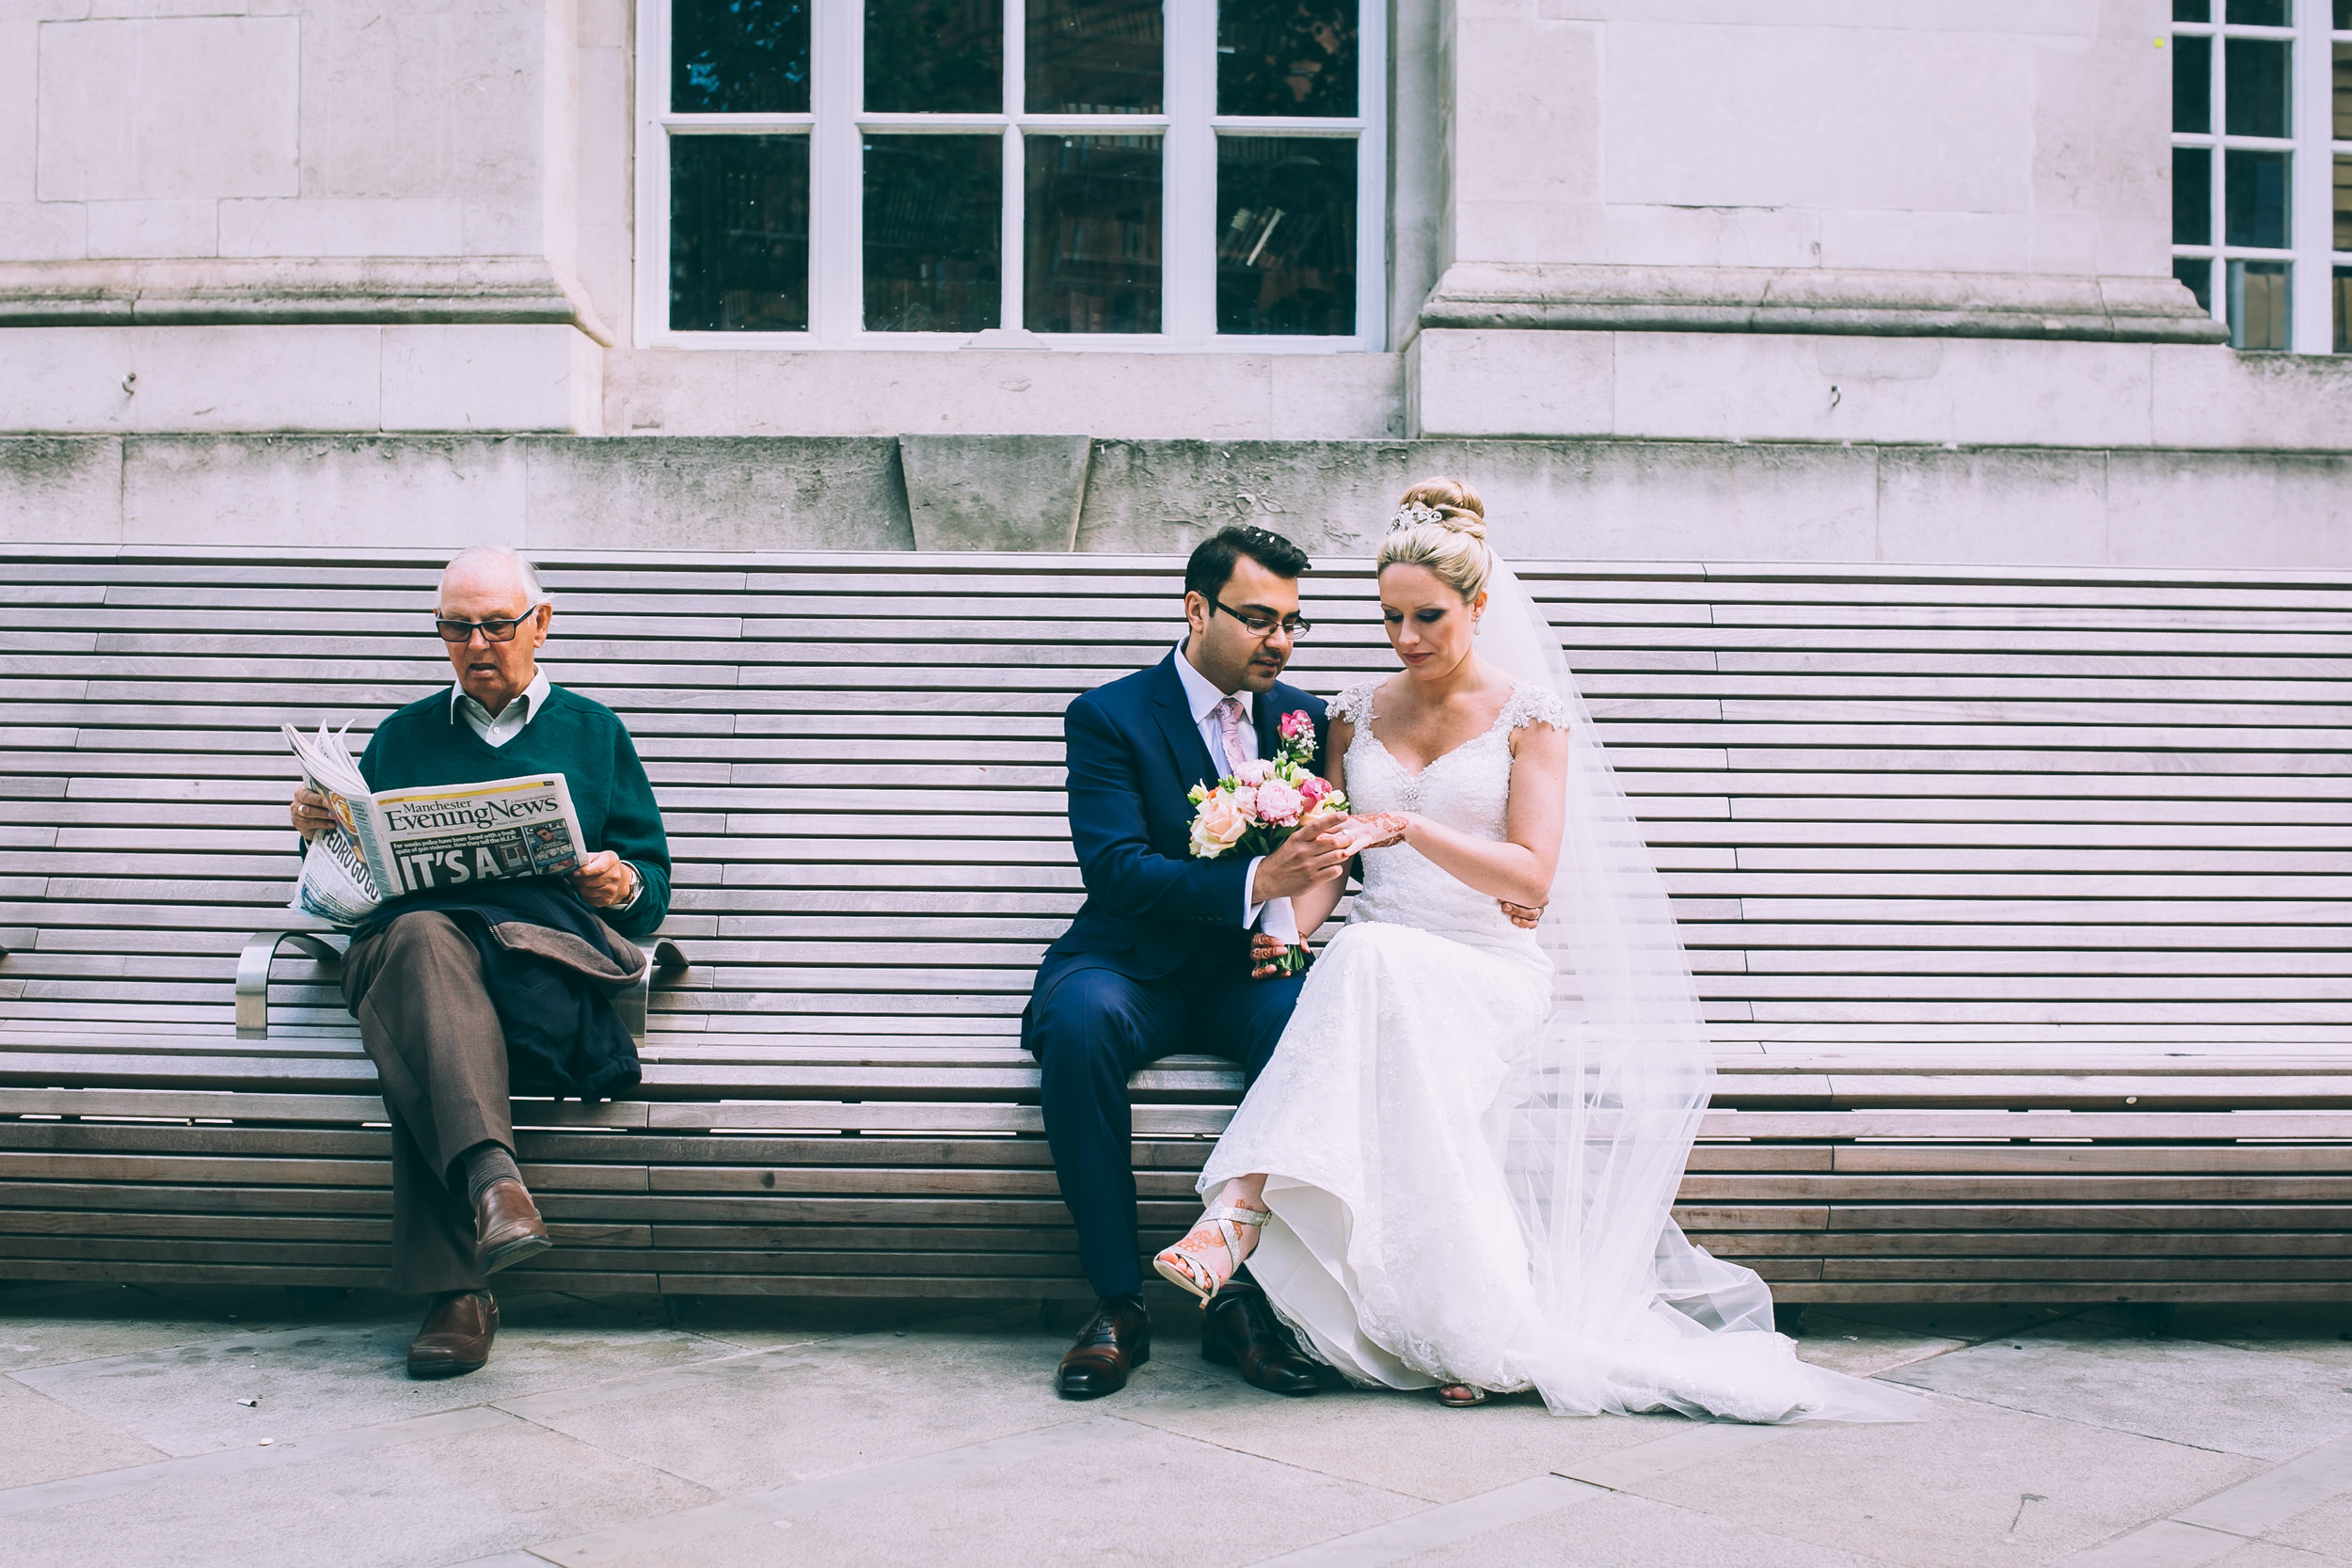 Nish&Emma-DAYTHREE-Wedding-in-manchester-town-hall-tom-biddle-photography-tb255.jpg